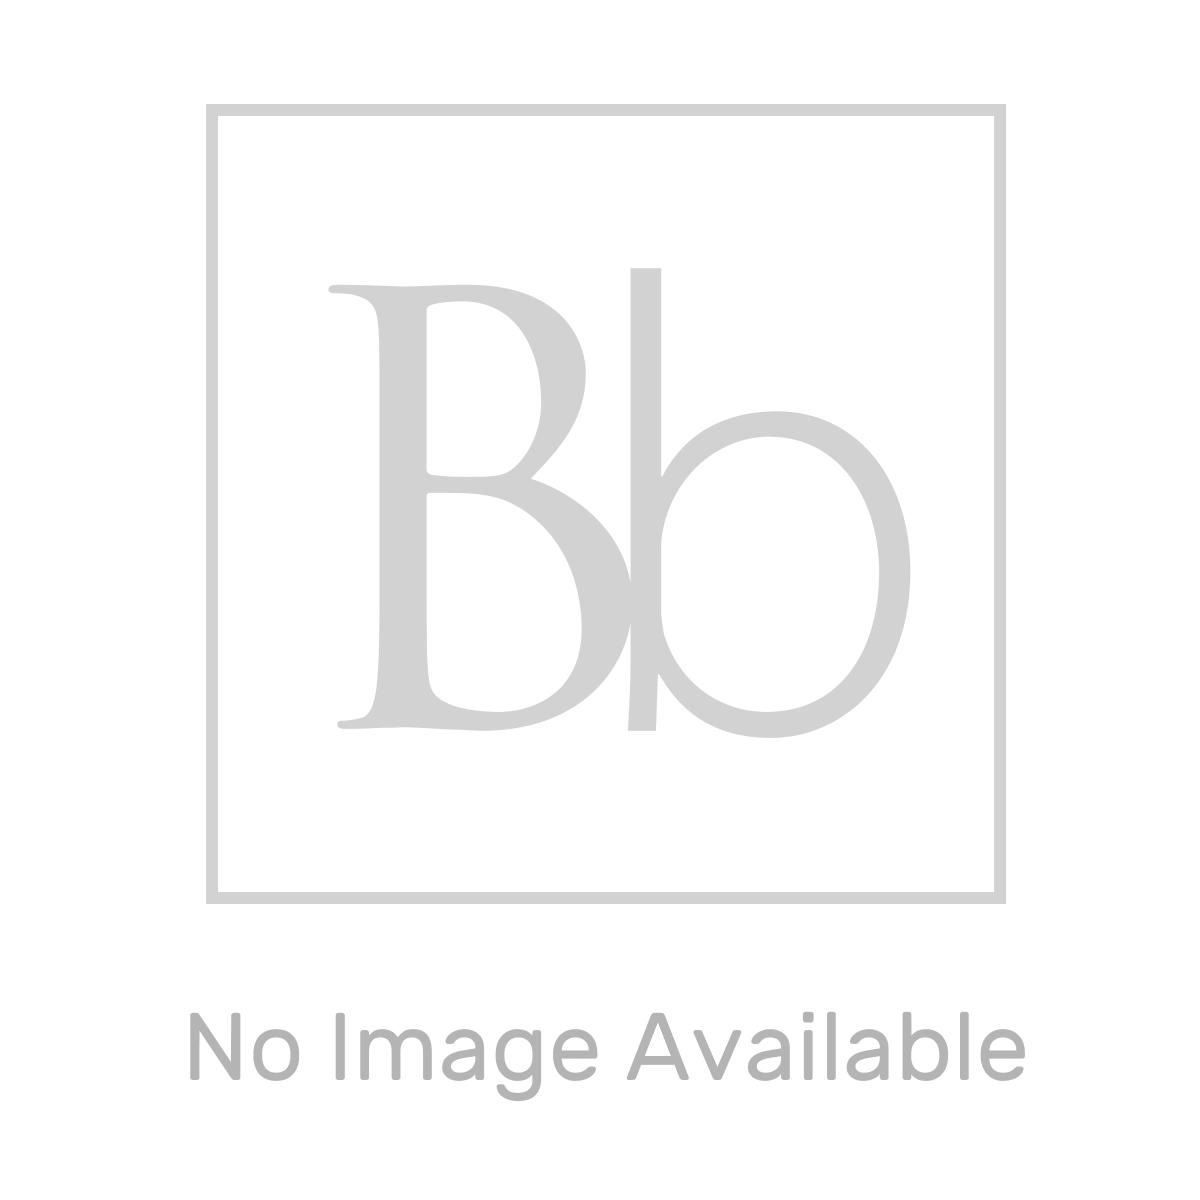 RAK Surface Matt Mid Grey Tile 300 x 600mm Lifestyle